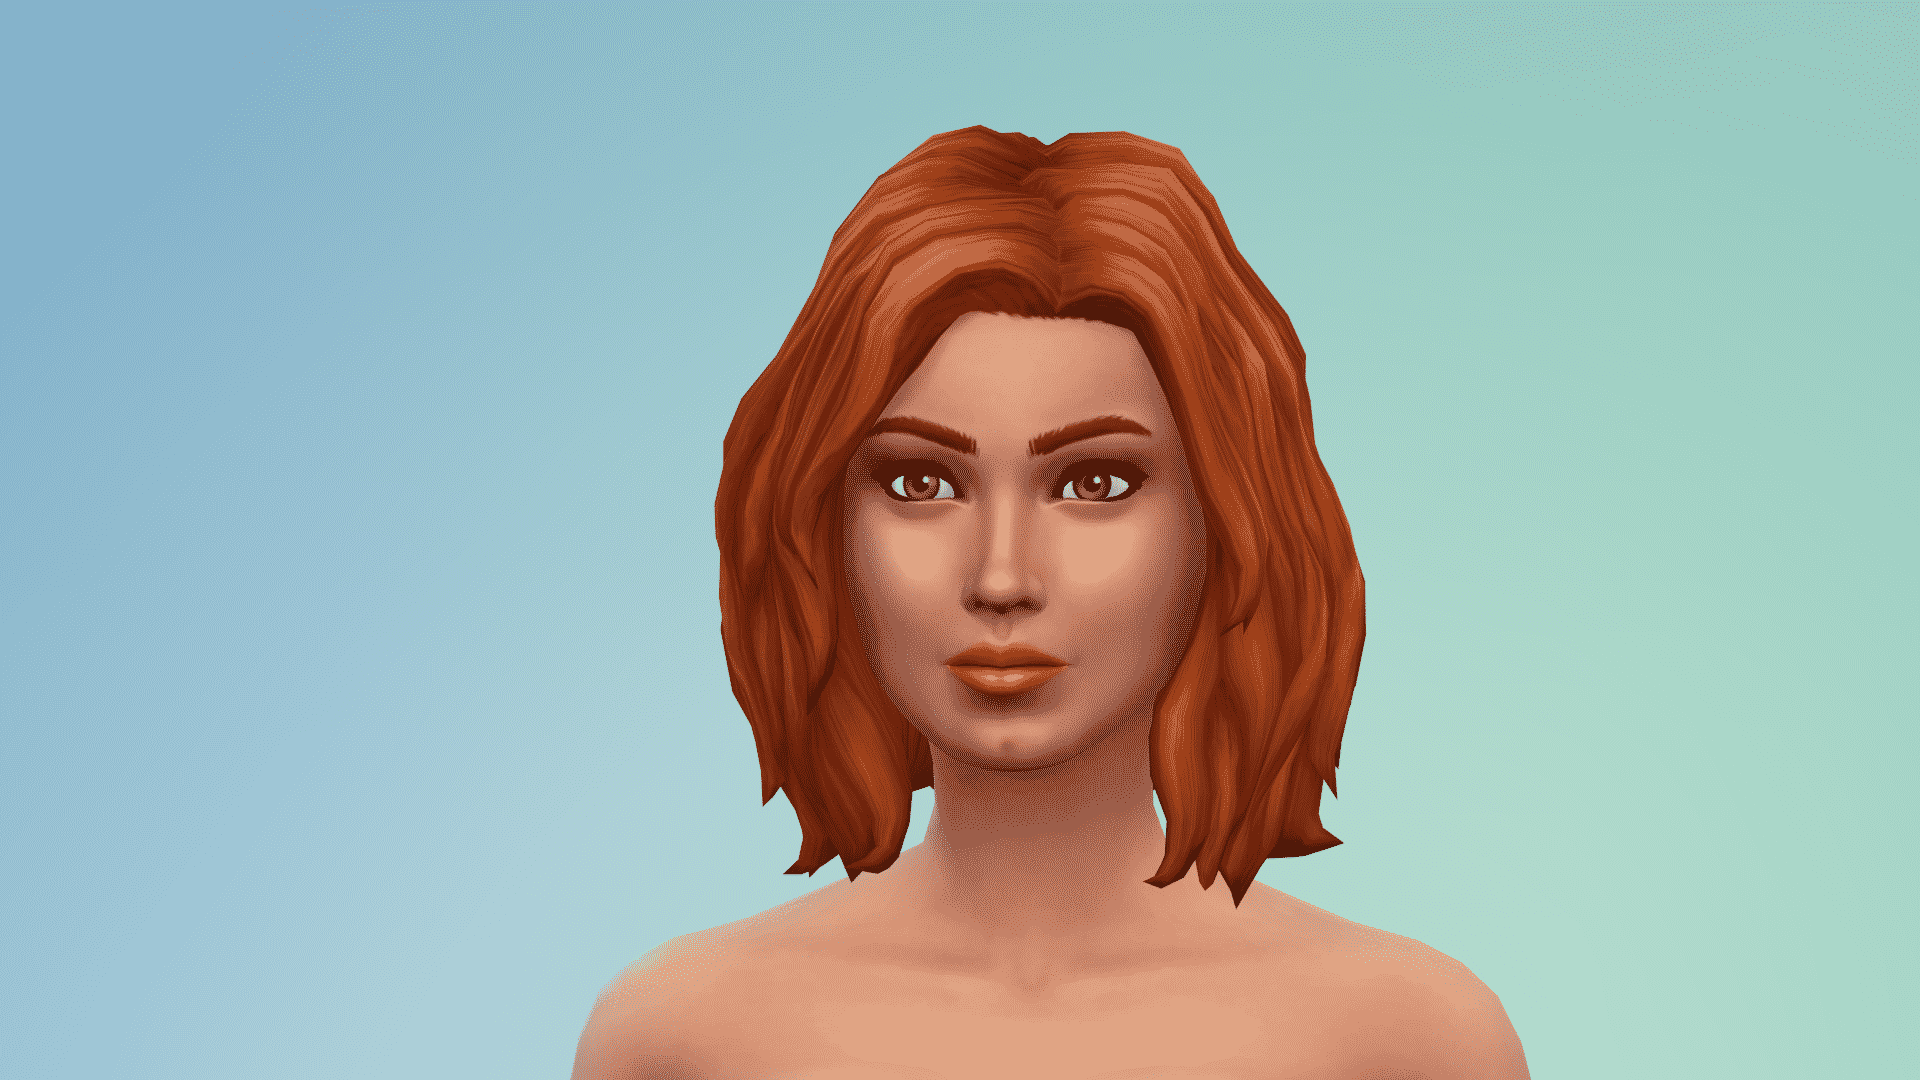 The Sims 4 Backyard Stuff Cas Overview